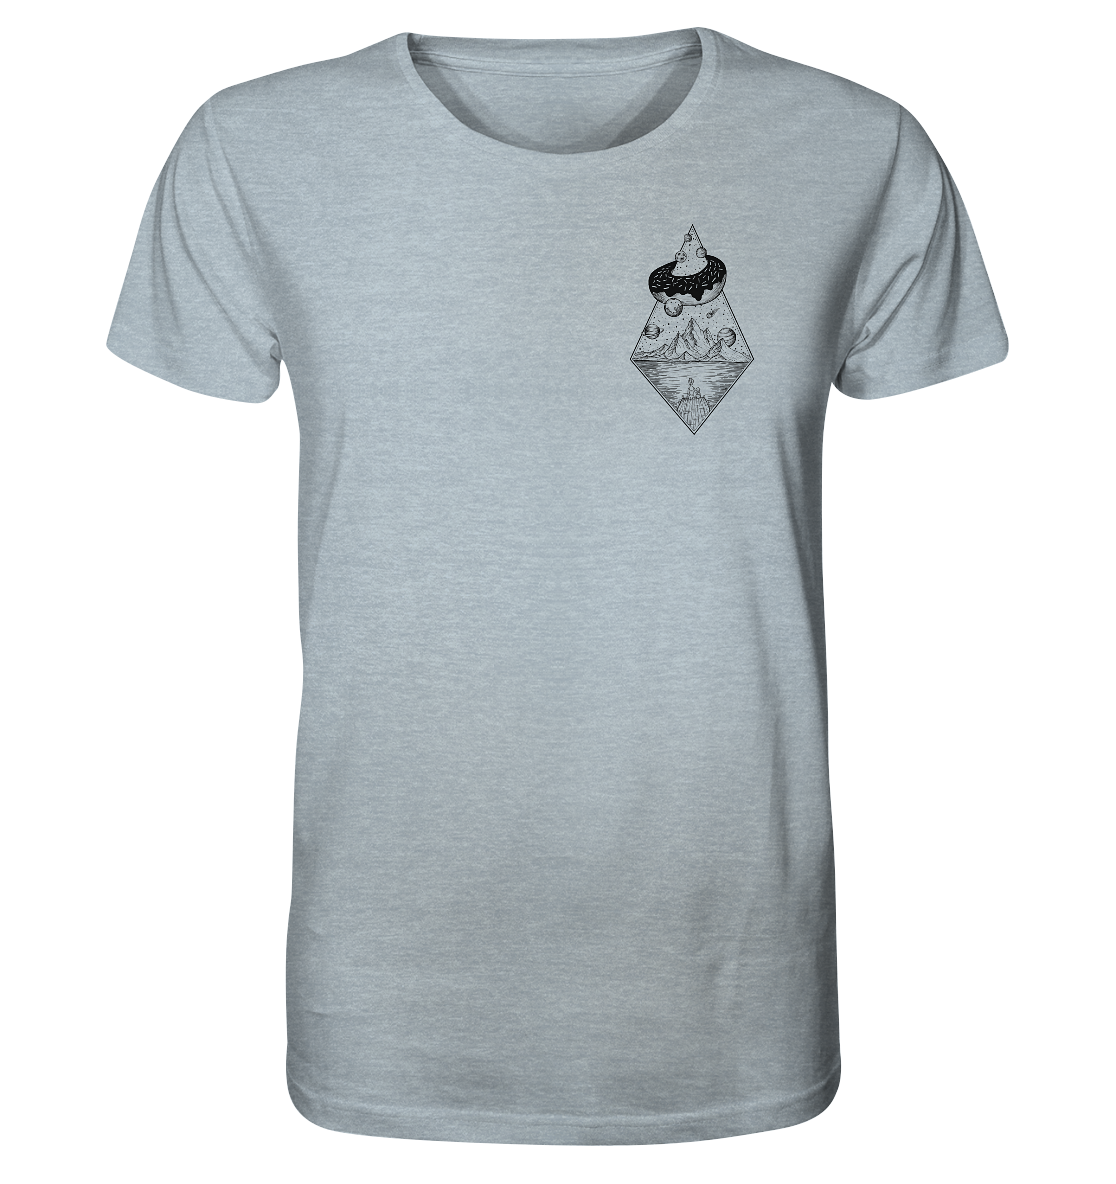 front-organic-shirt-meliert-adbfcb-1116x.png